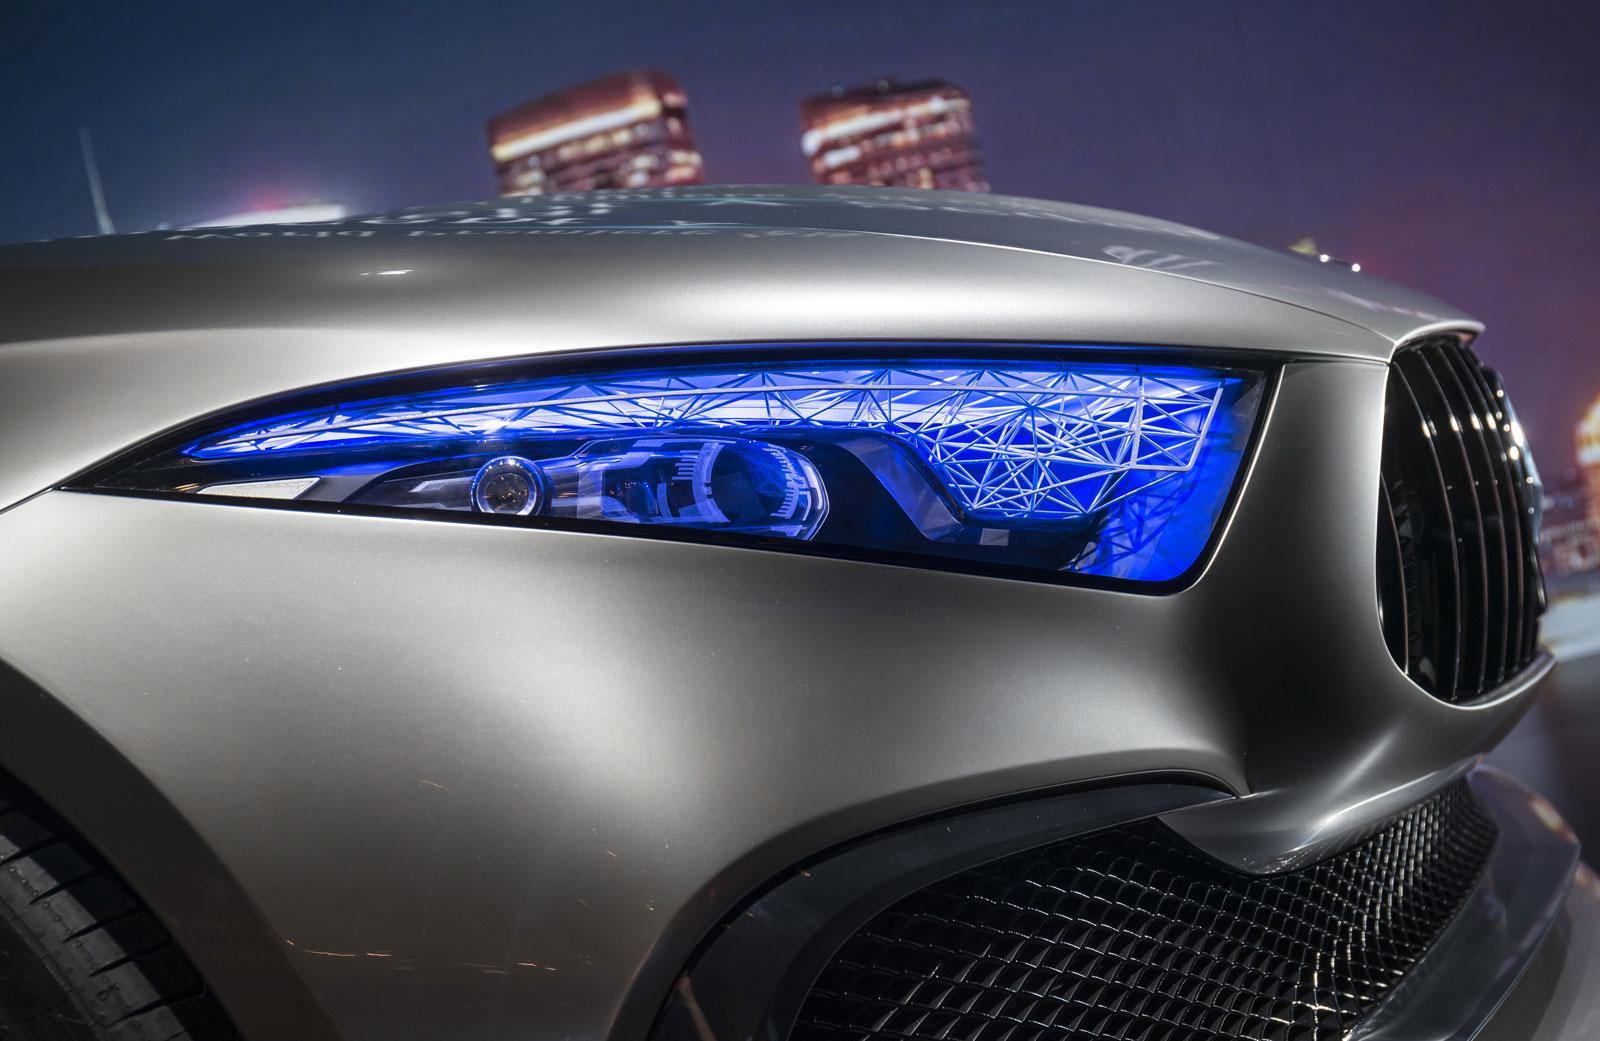 http://www.carbodydesign.com/media/2017/04/Mercedes-Benz-Concept-A-Sedan-at-the-2017-Shanghai-Show-09.jpg